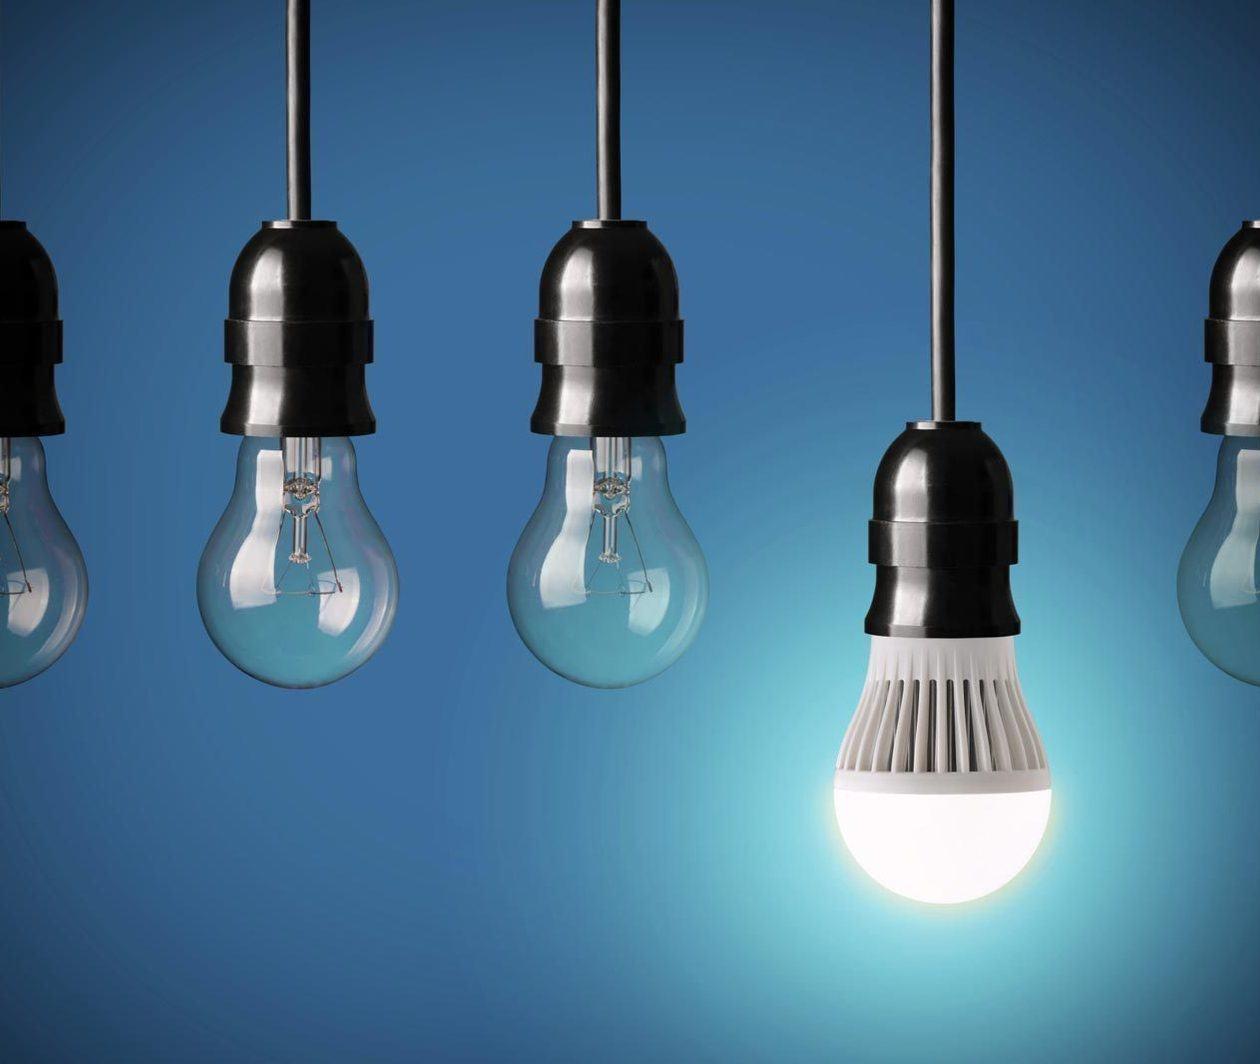 Innovation and Enterprise